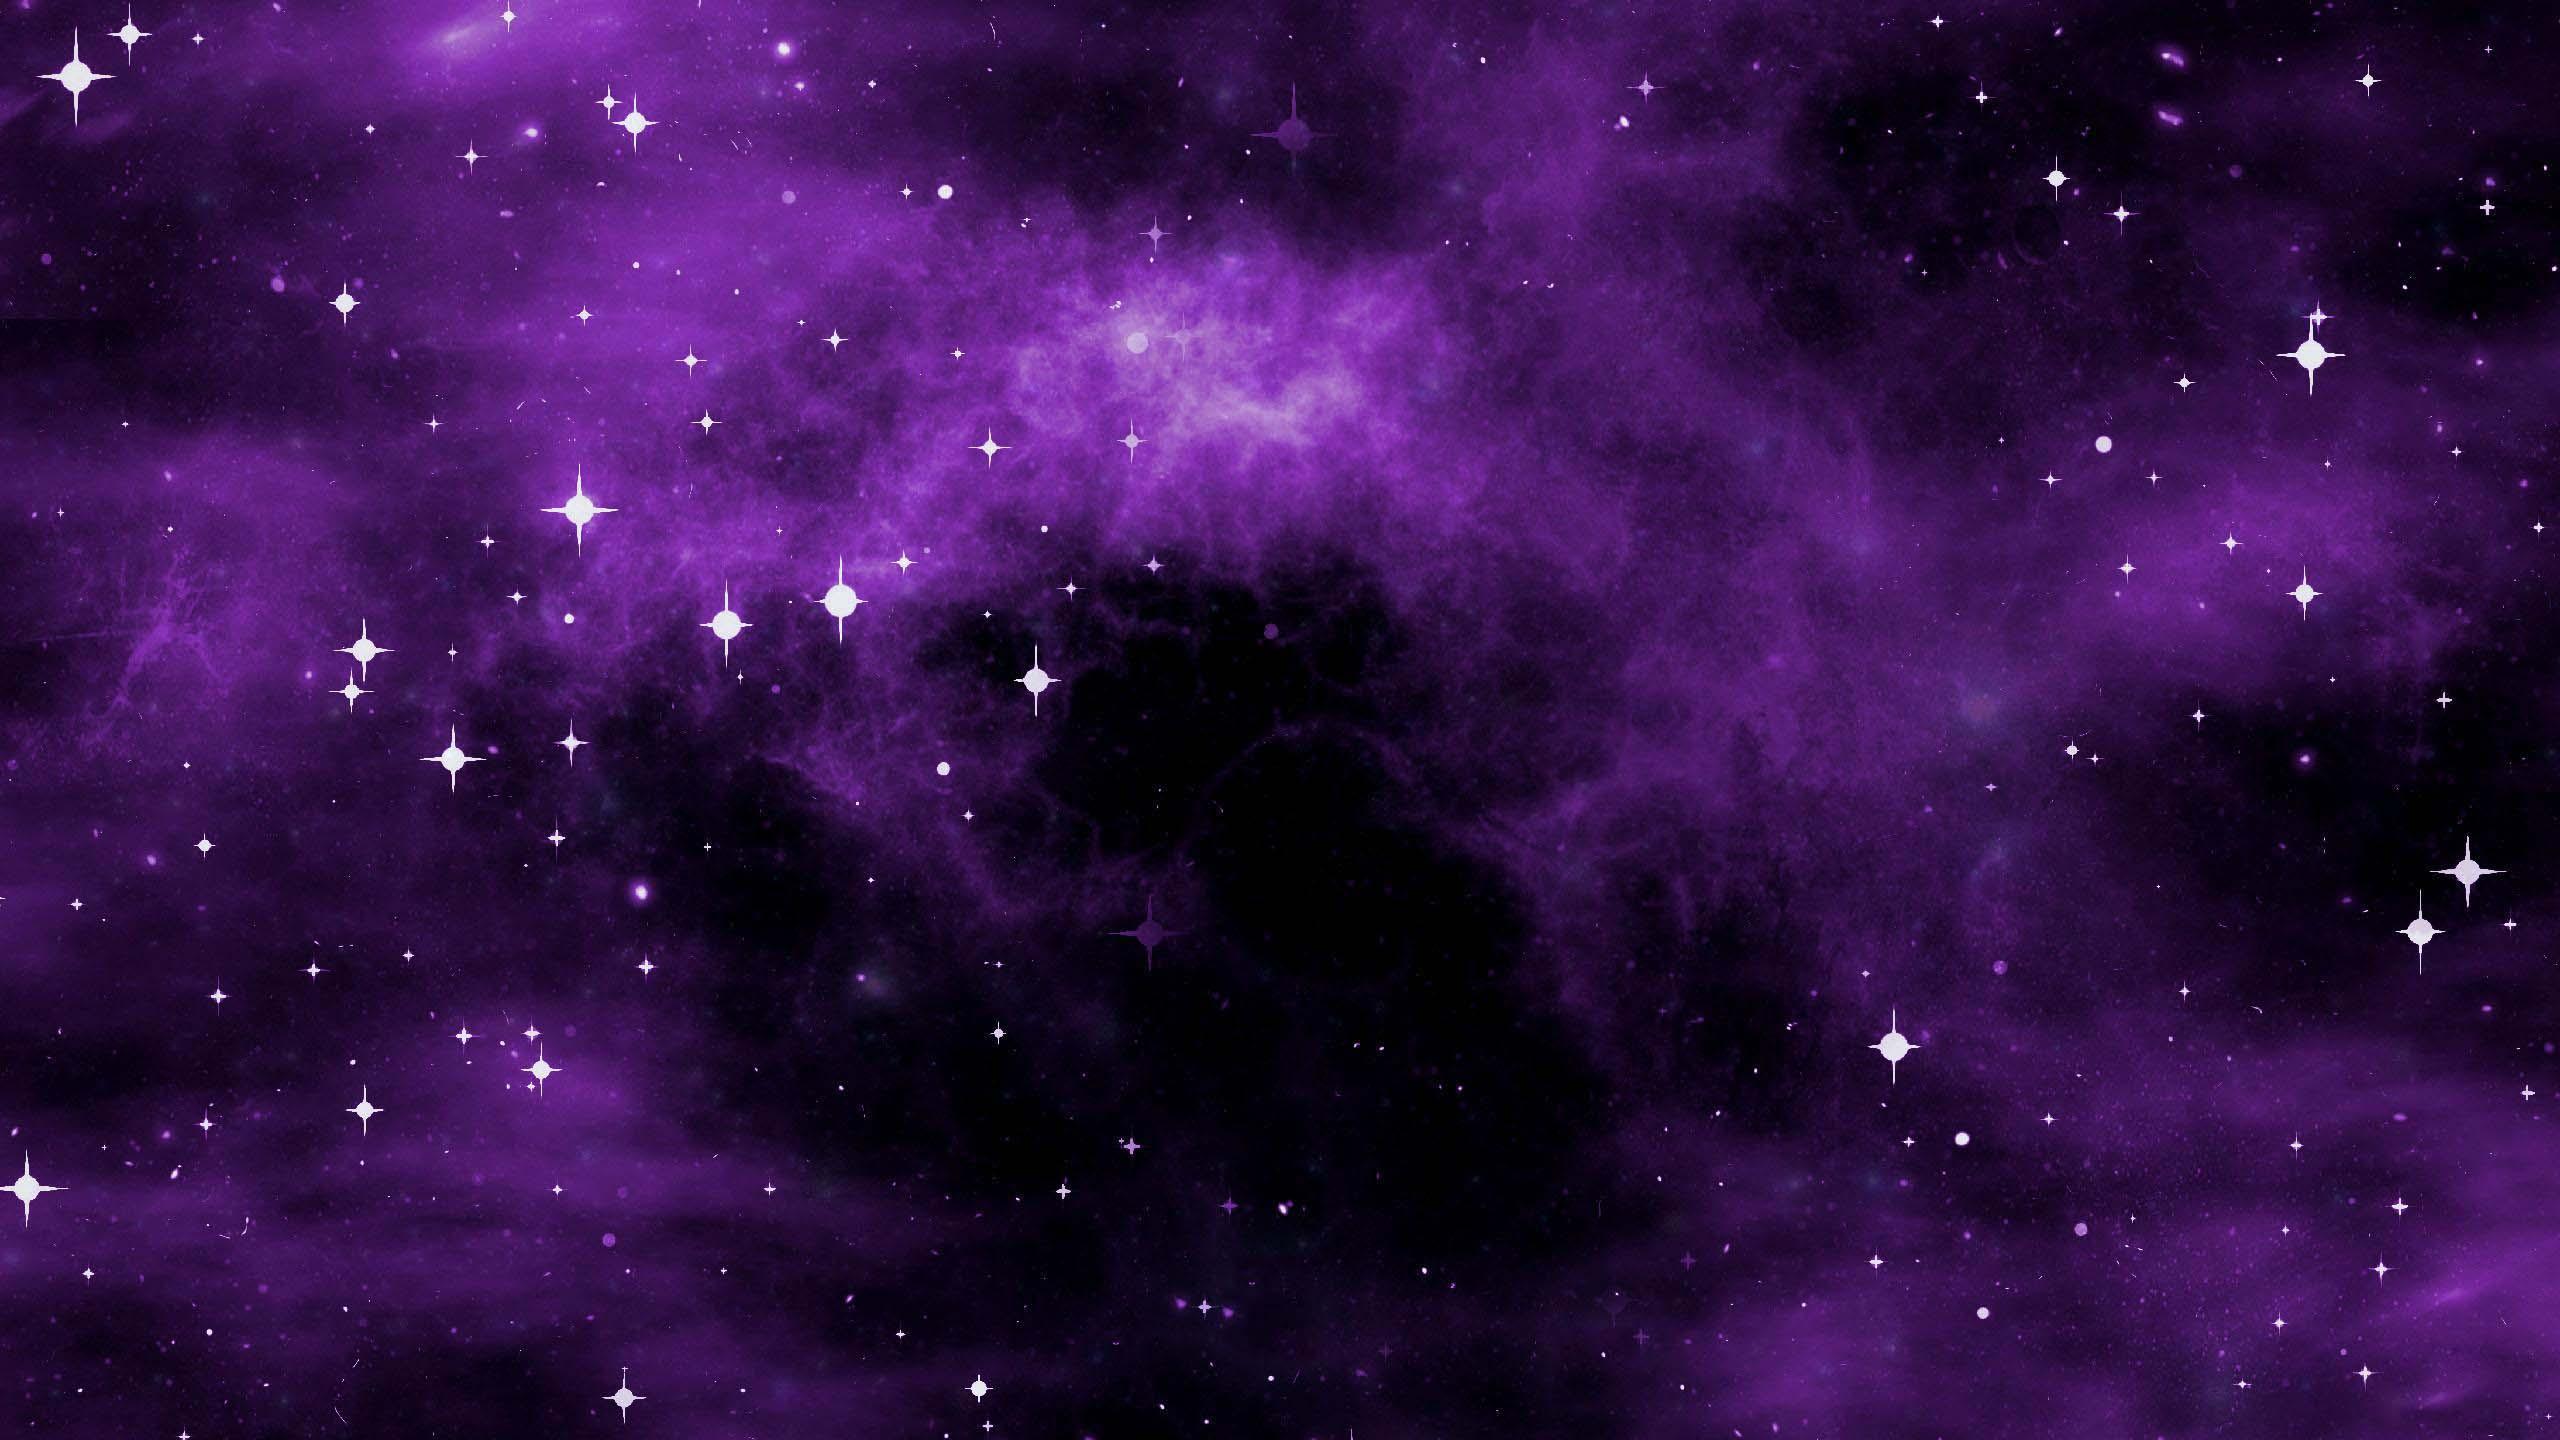 Nice starry galaxy wallpaper